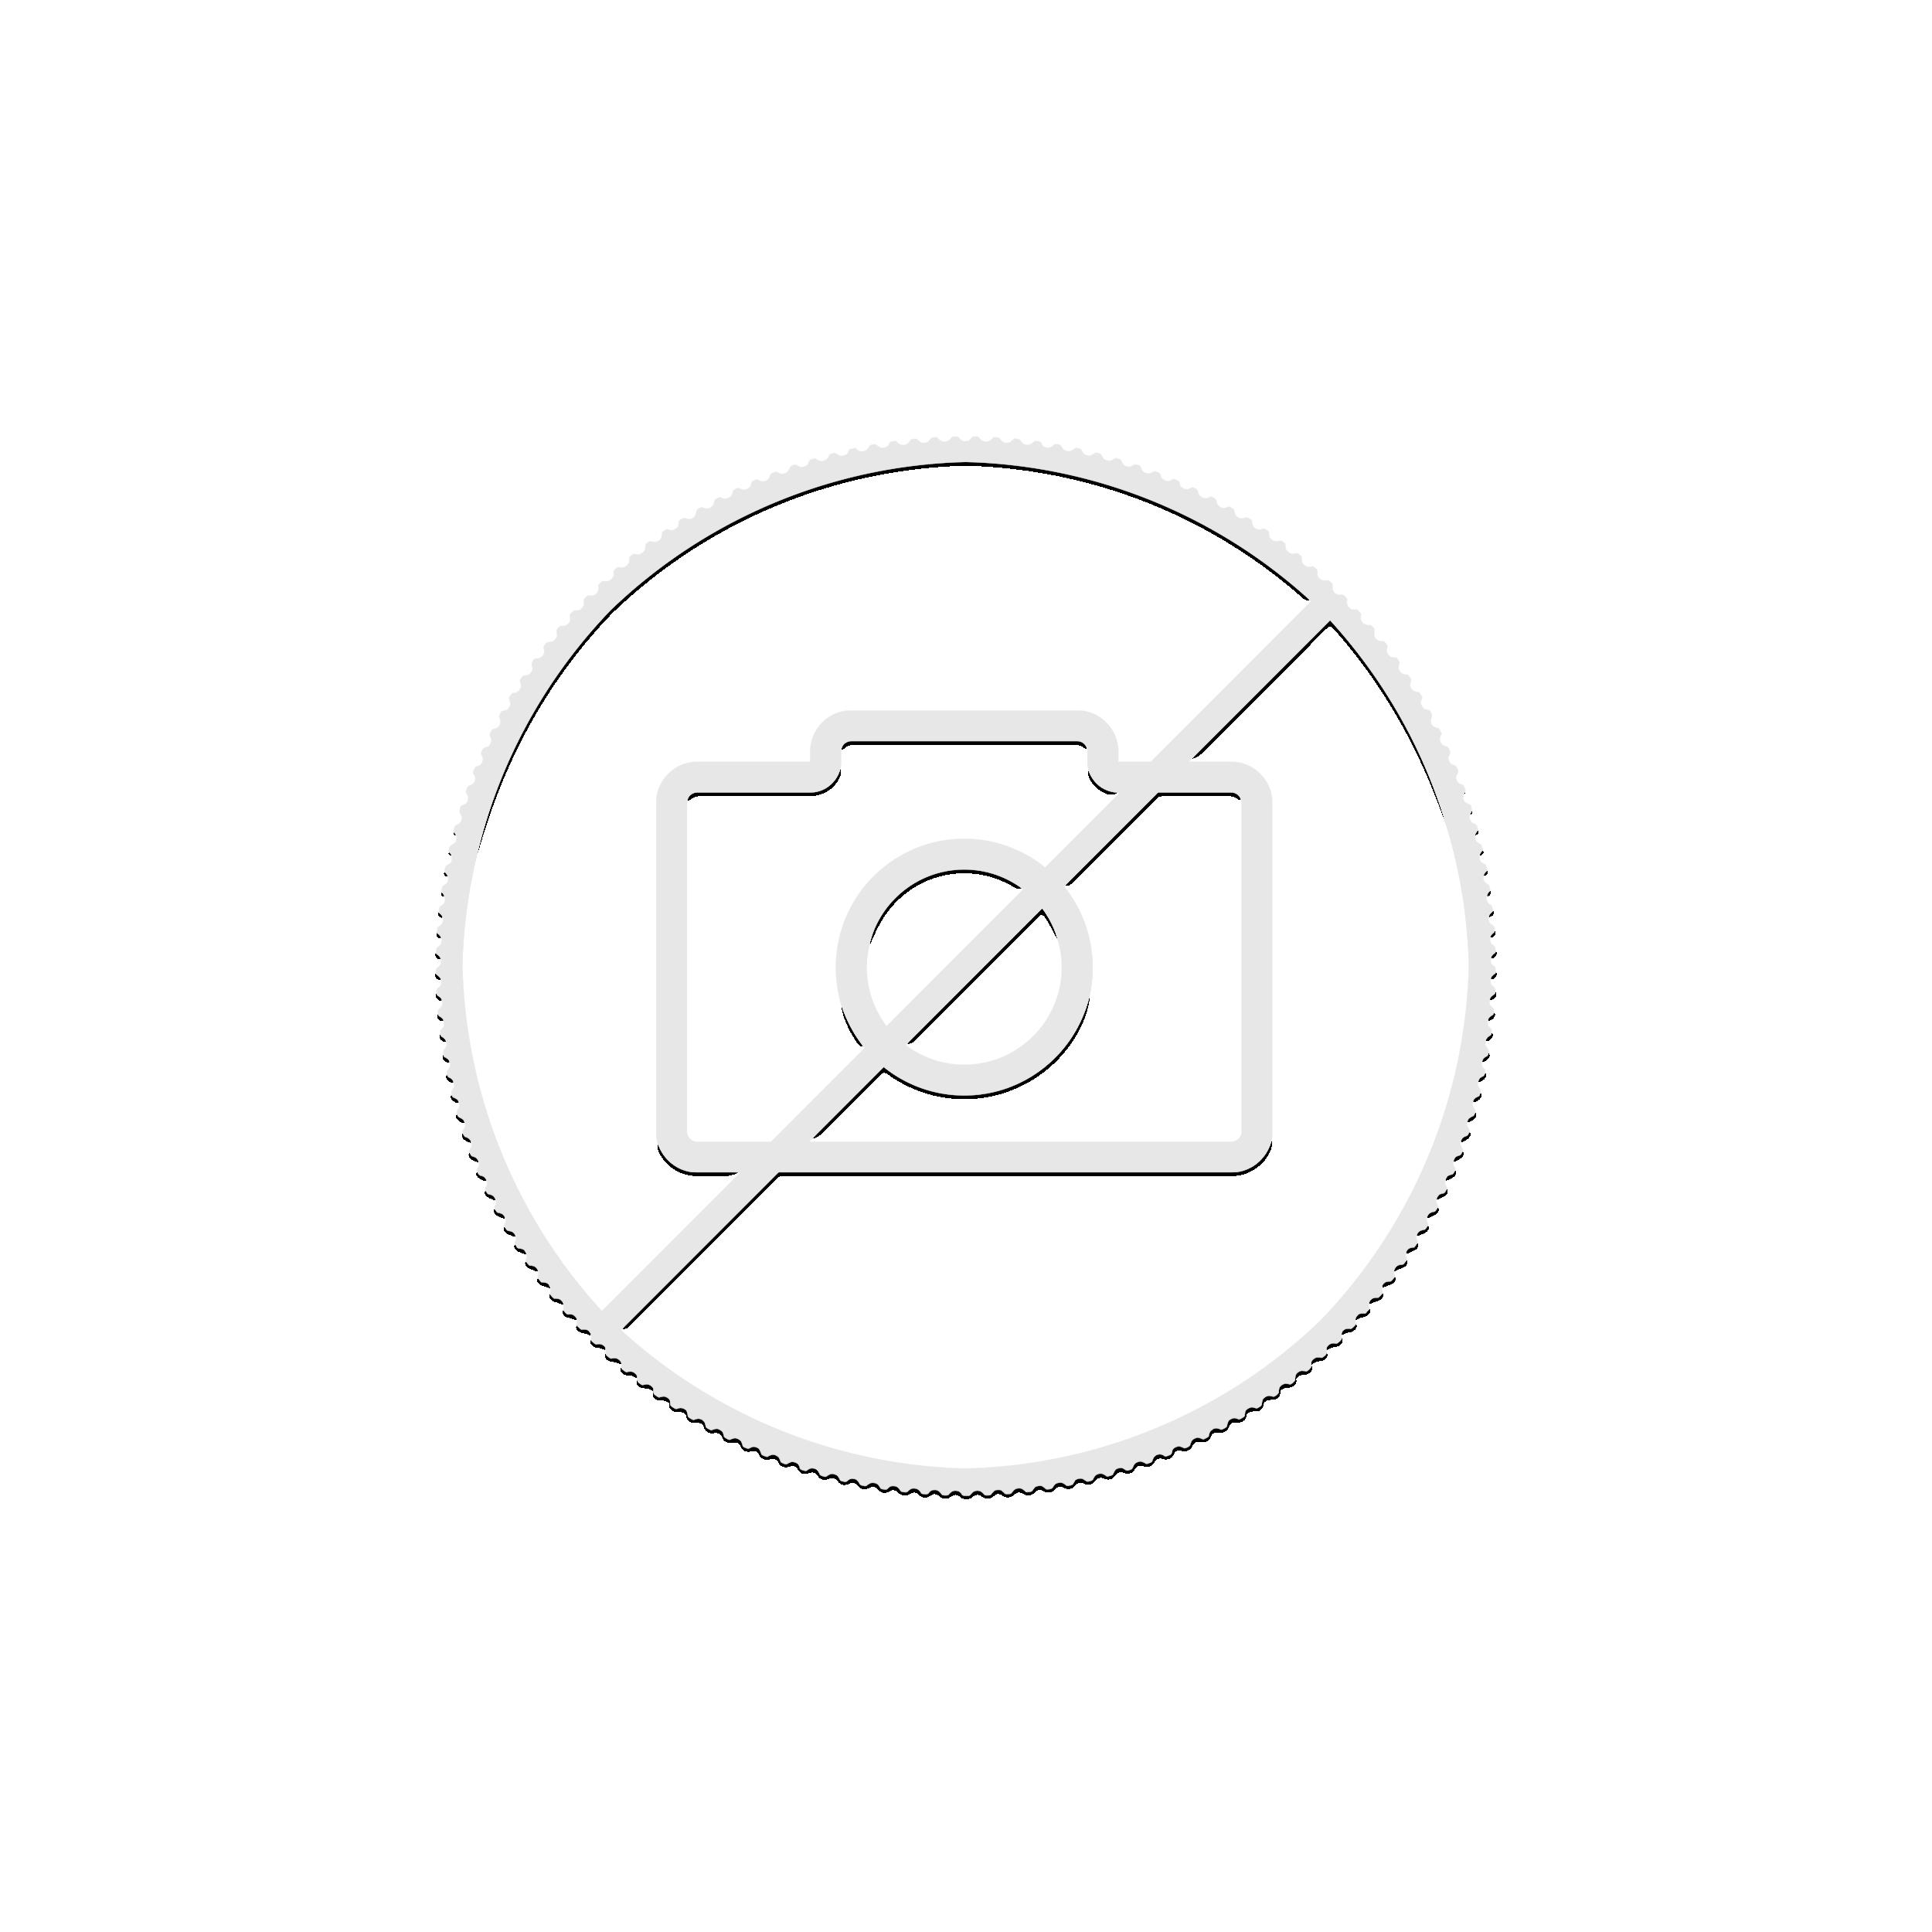 Floral alphabet - zilveren penningen - Franklin Mint